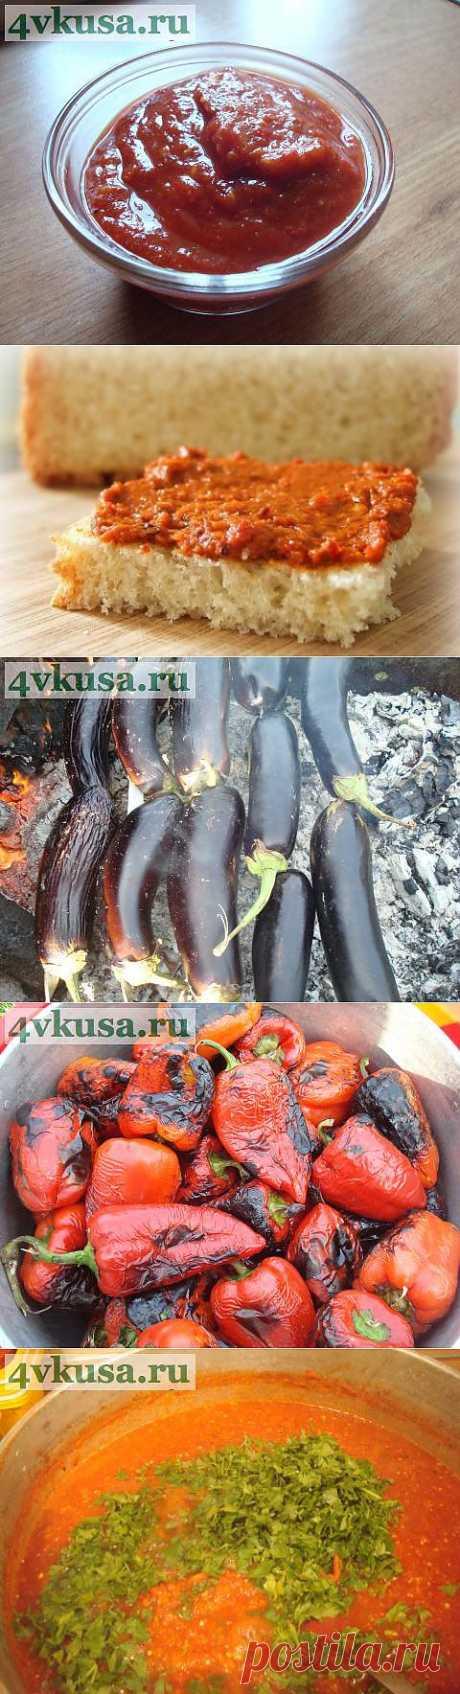 """Лютеница"" | 4vkusa.ru"